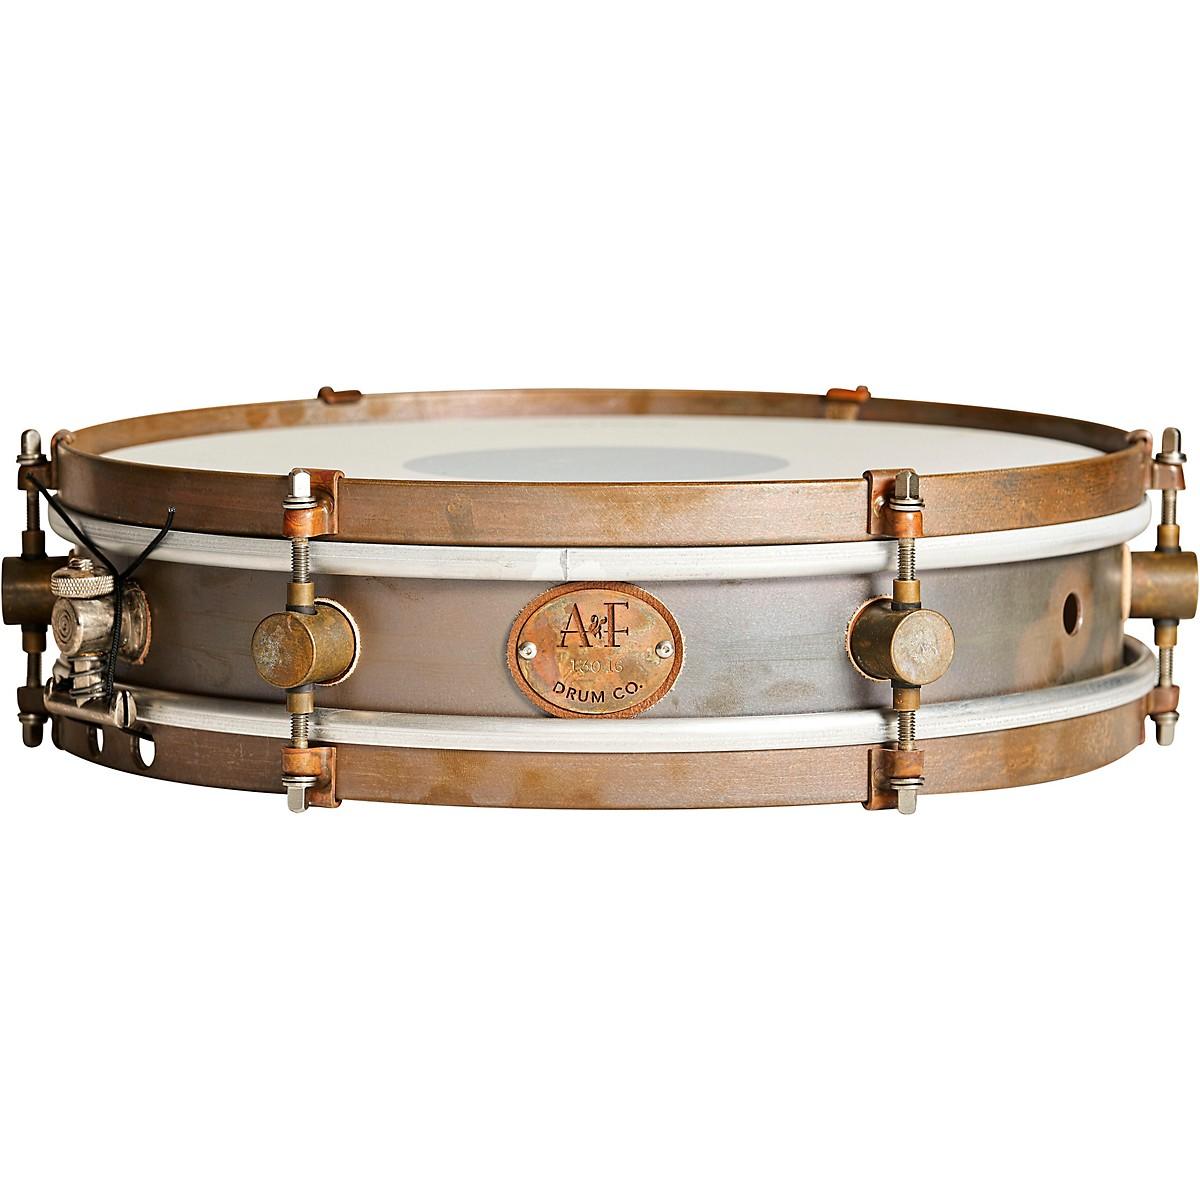 A&F Drum Co Rude Boy Brass Snare